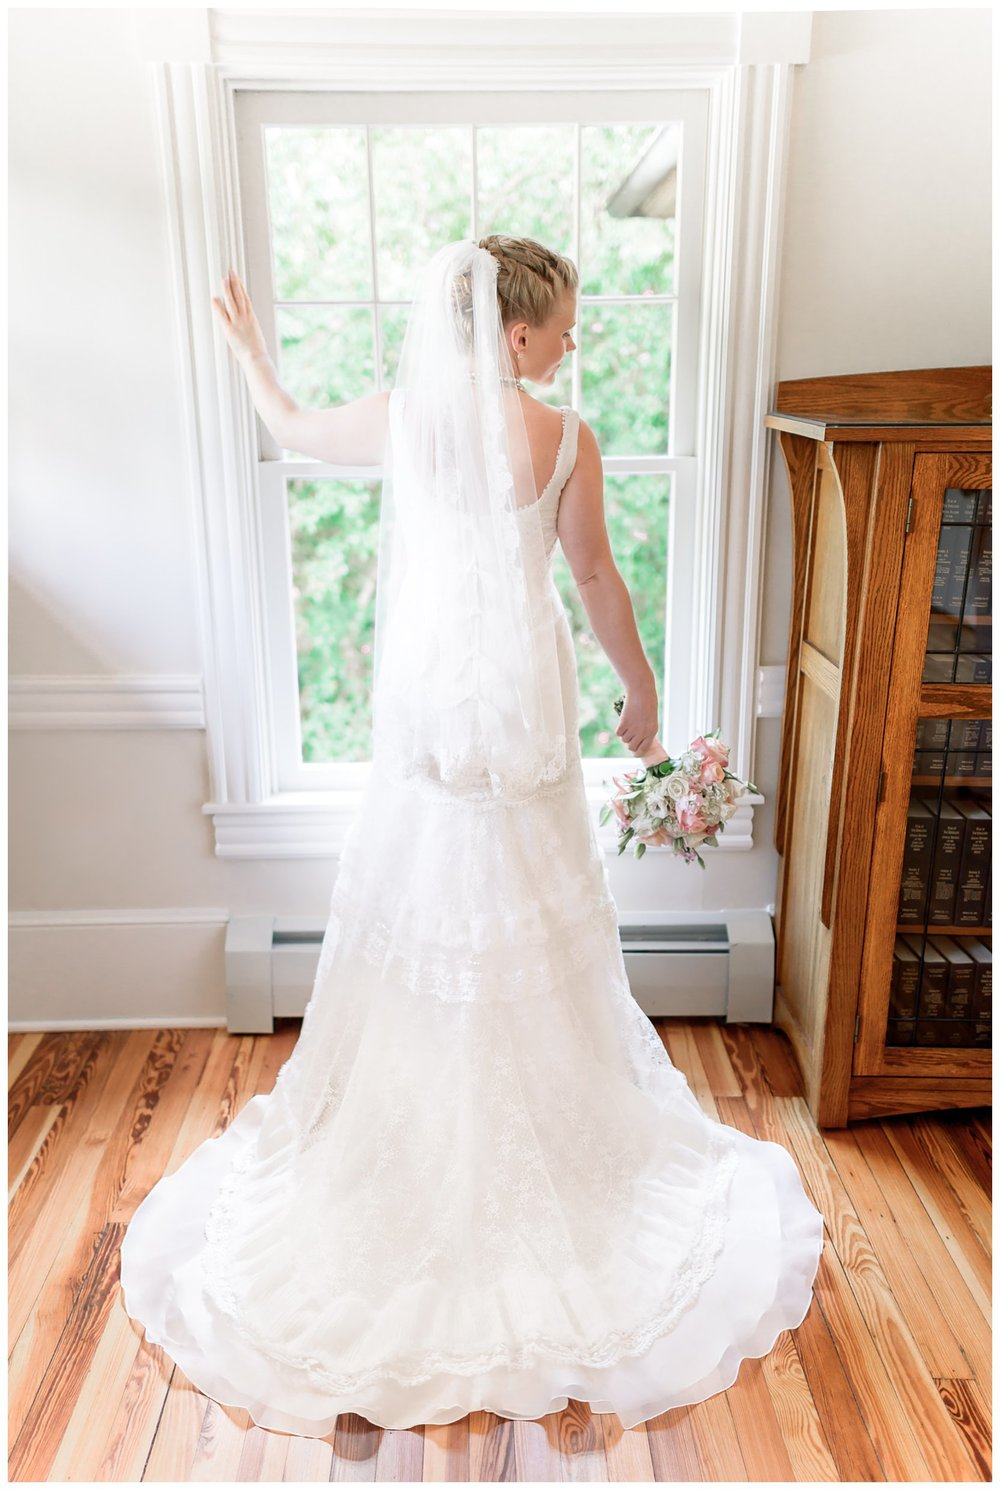 Della and Andrew Wedding Photos_Hendry House Arlington Virginia_Stephanie Kopf Photography_Northern Virginia Wedding Photography-6.jpg